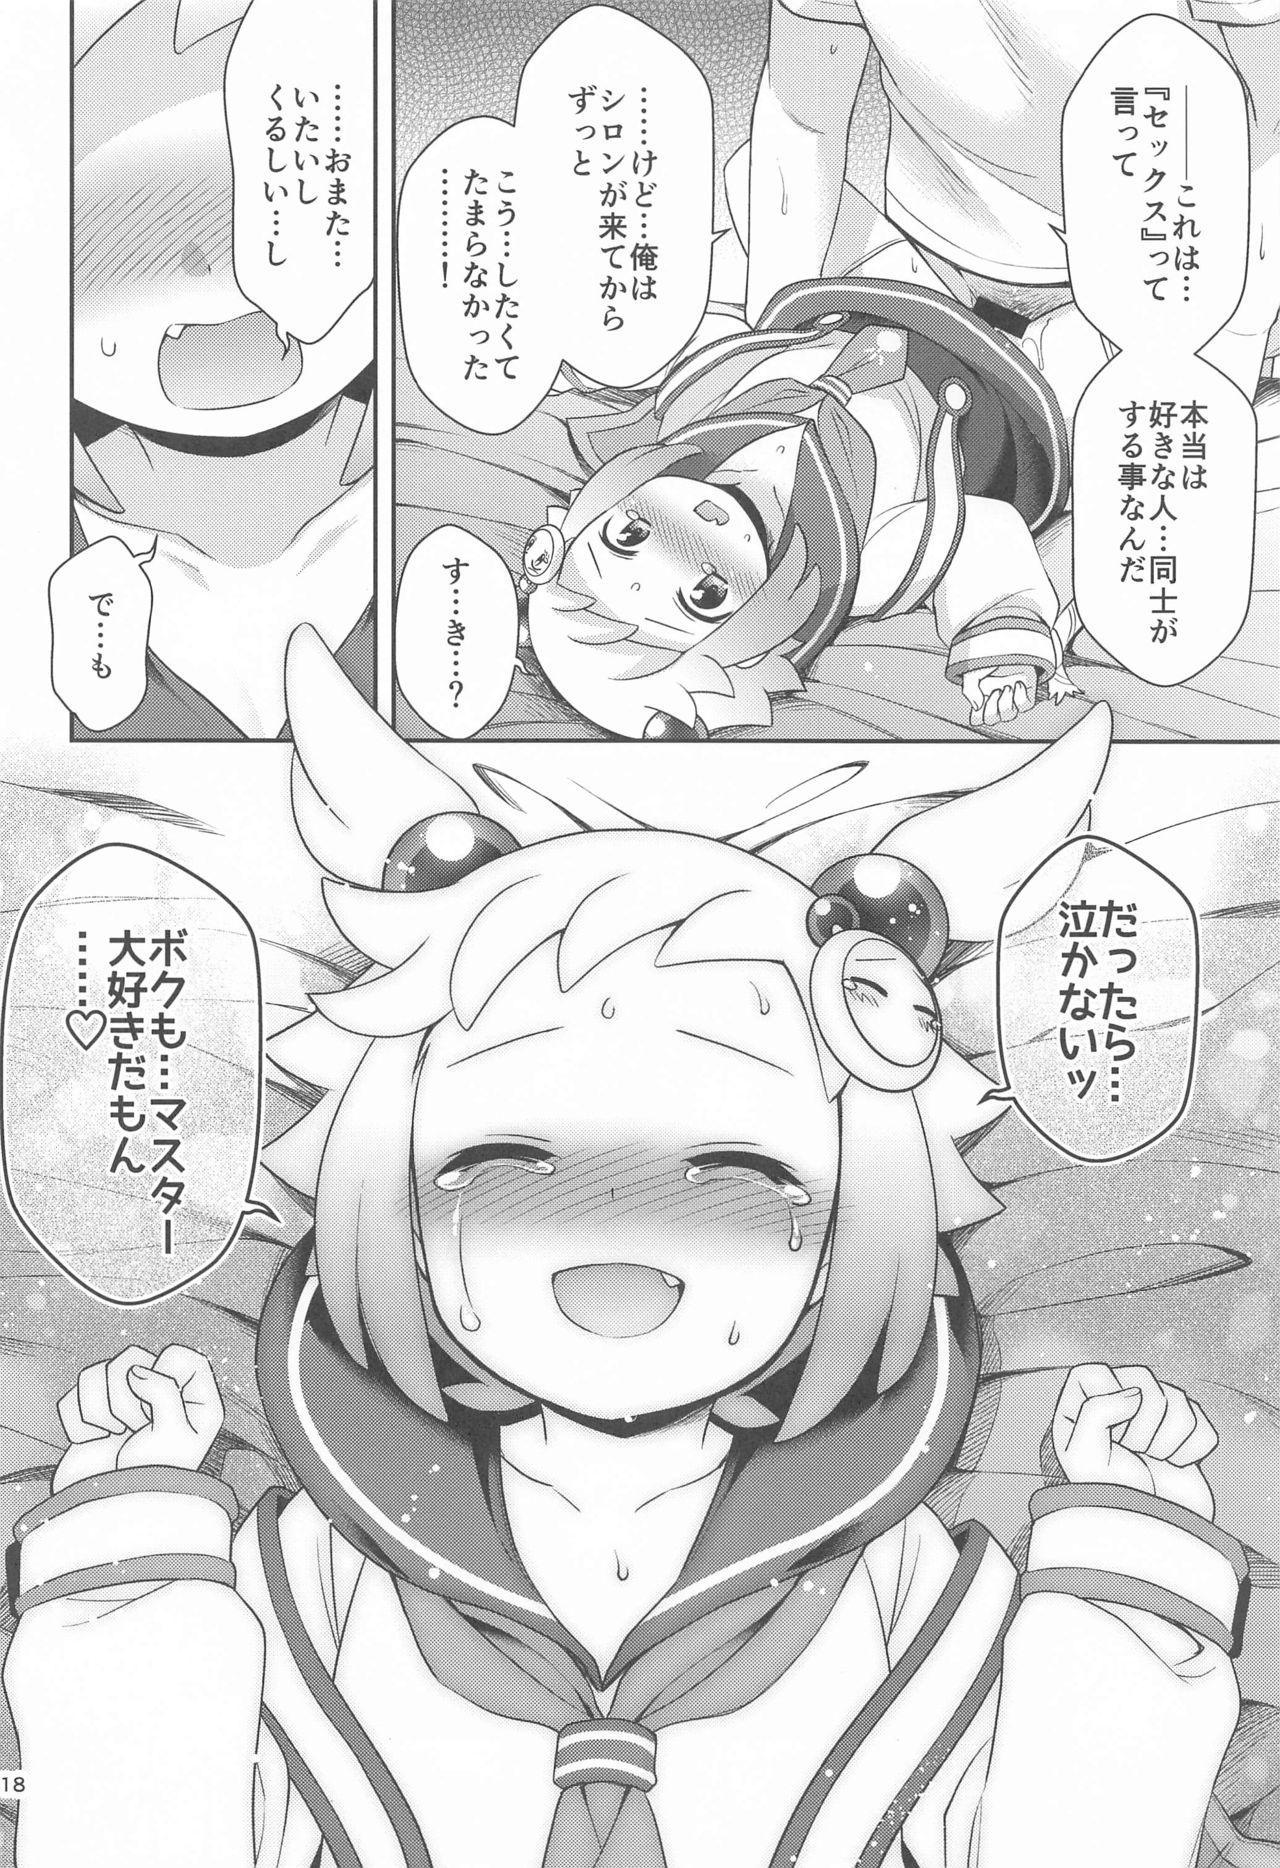 Shiron to LoveHo de Ecchi Suru 16